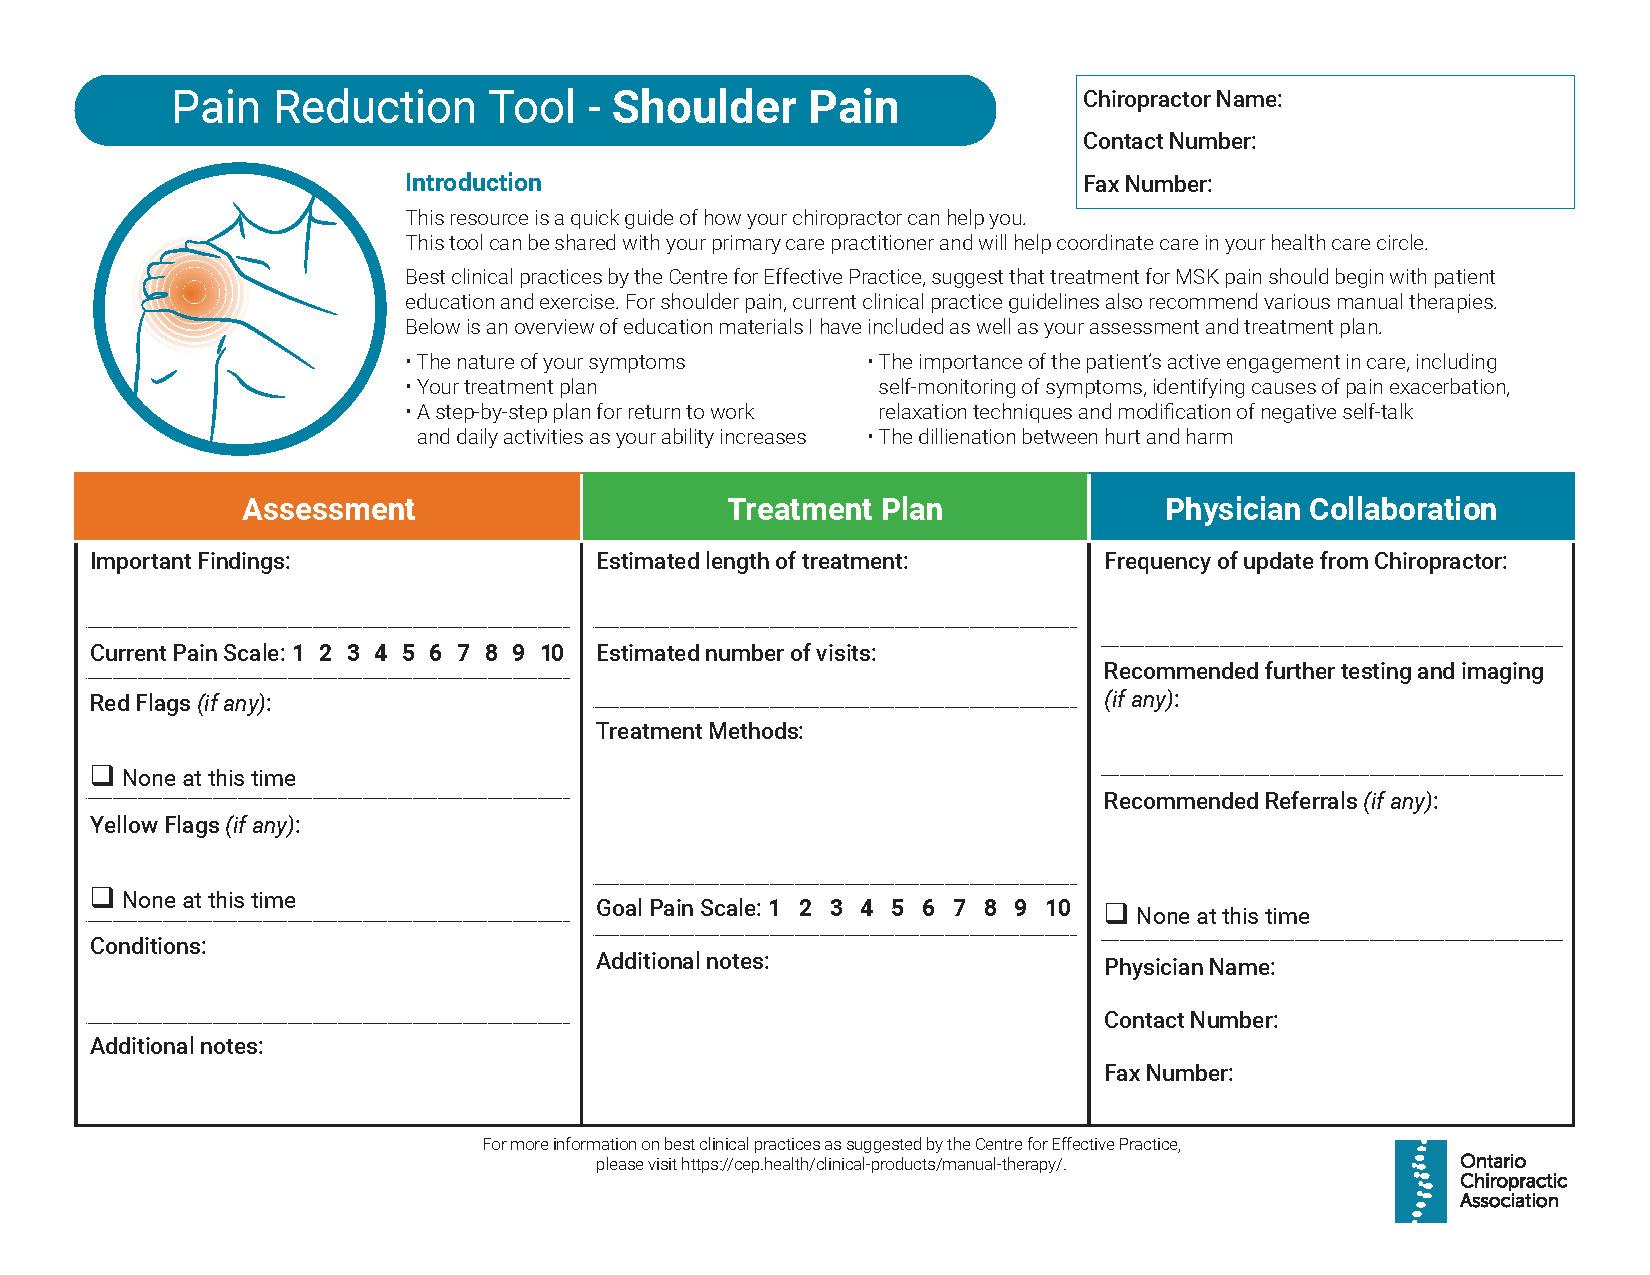 Thumbnail of Pain Reduction Tool - Shoulder Pain